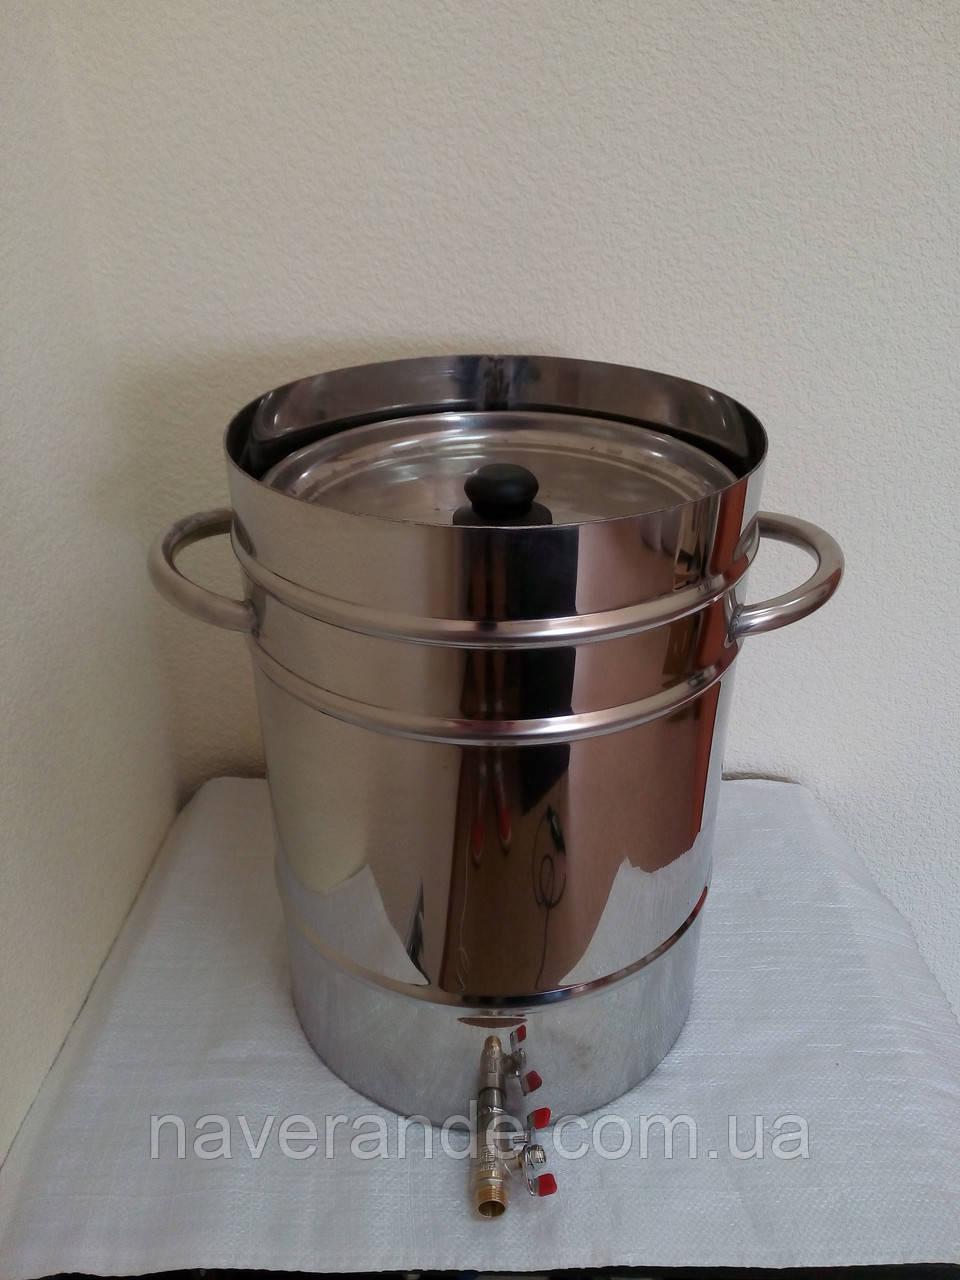 Мини пивоварня домашняя недорого самогонный аппарат из латуни своими руками